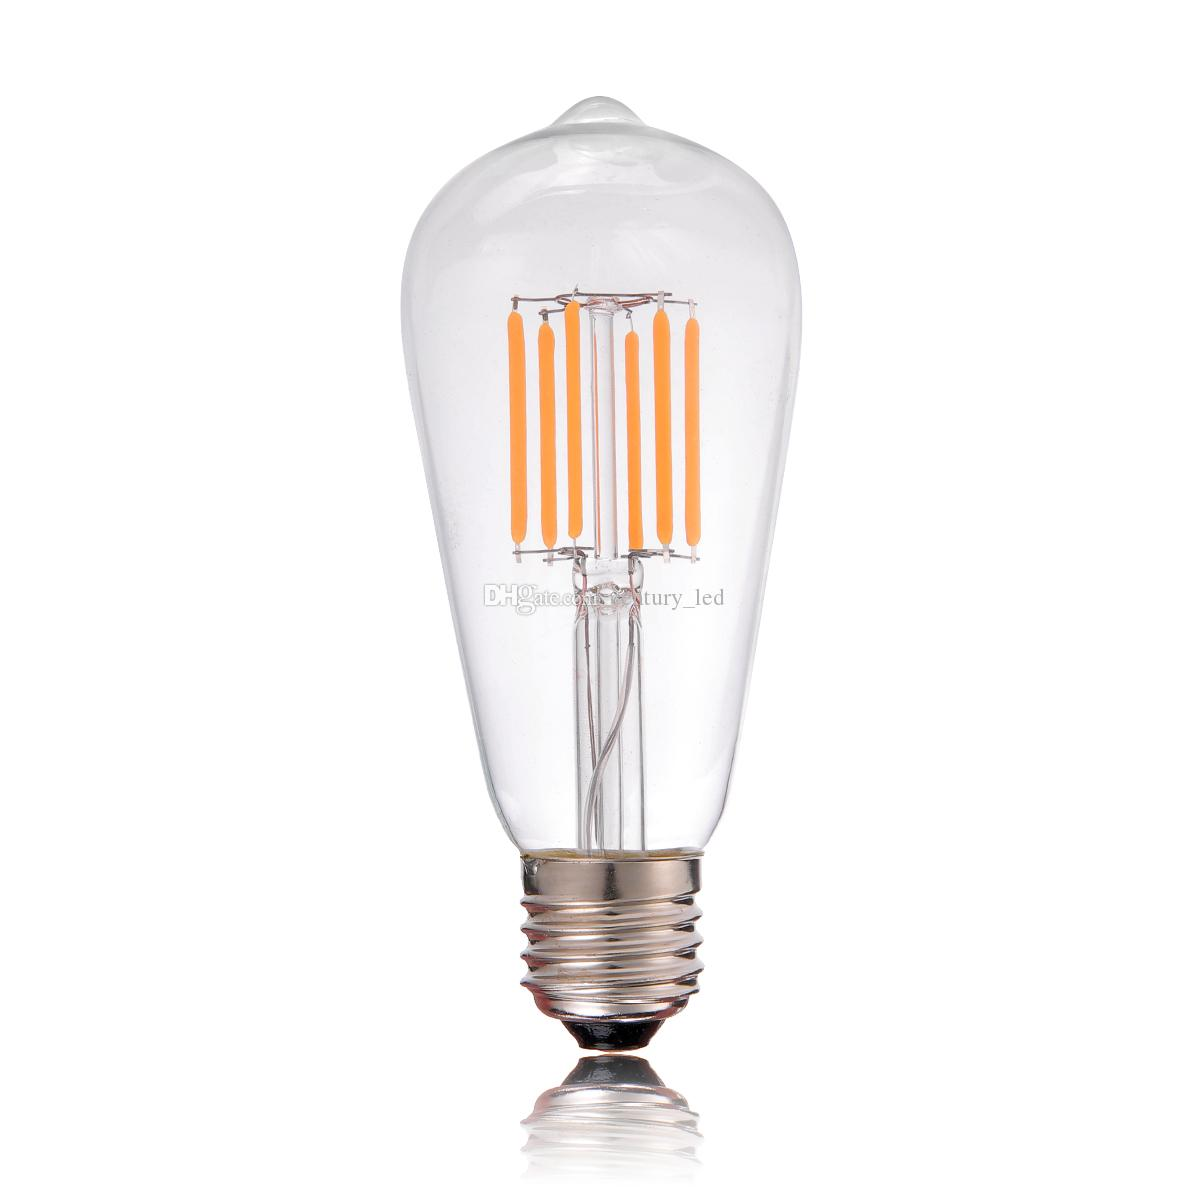 best vintage led filament bulb lightedison st58 style6w 2200ke26 e27 baseretro decorative mr16 led bulb cree led bulbs from centuryled - Decorative Light Bulbs